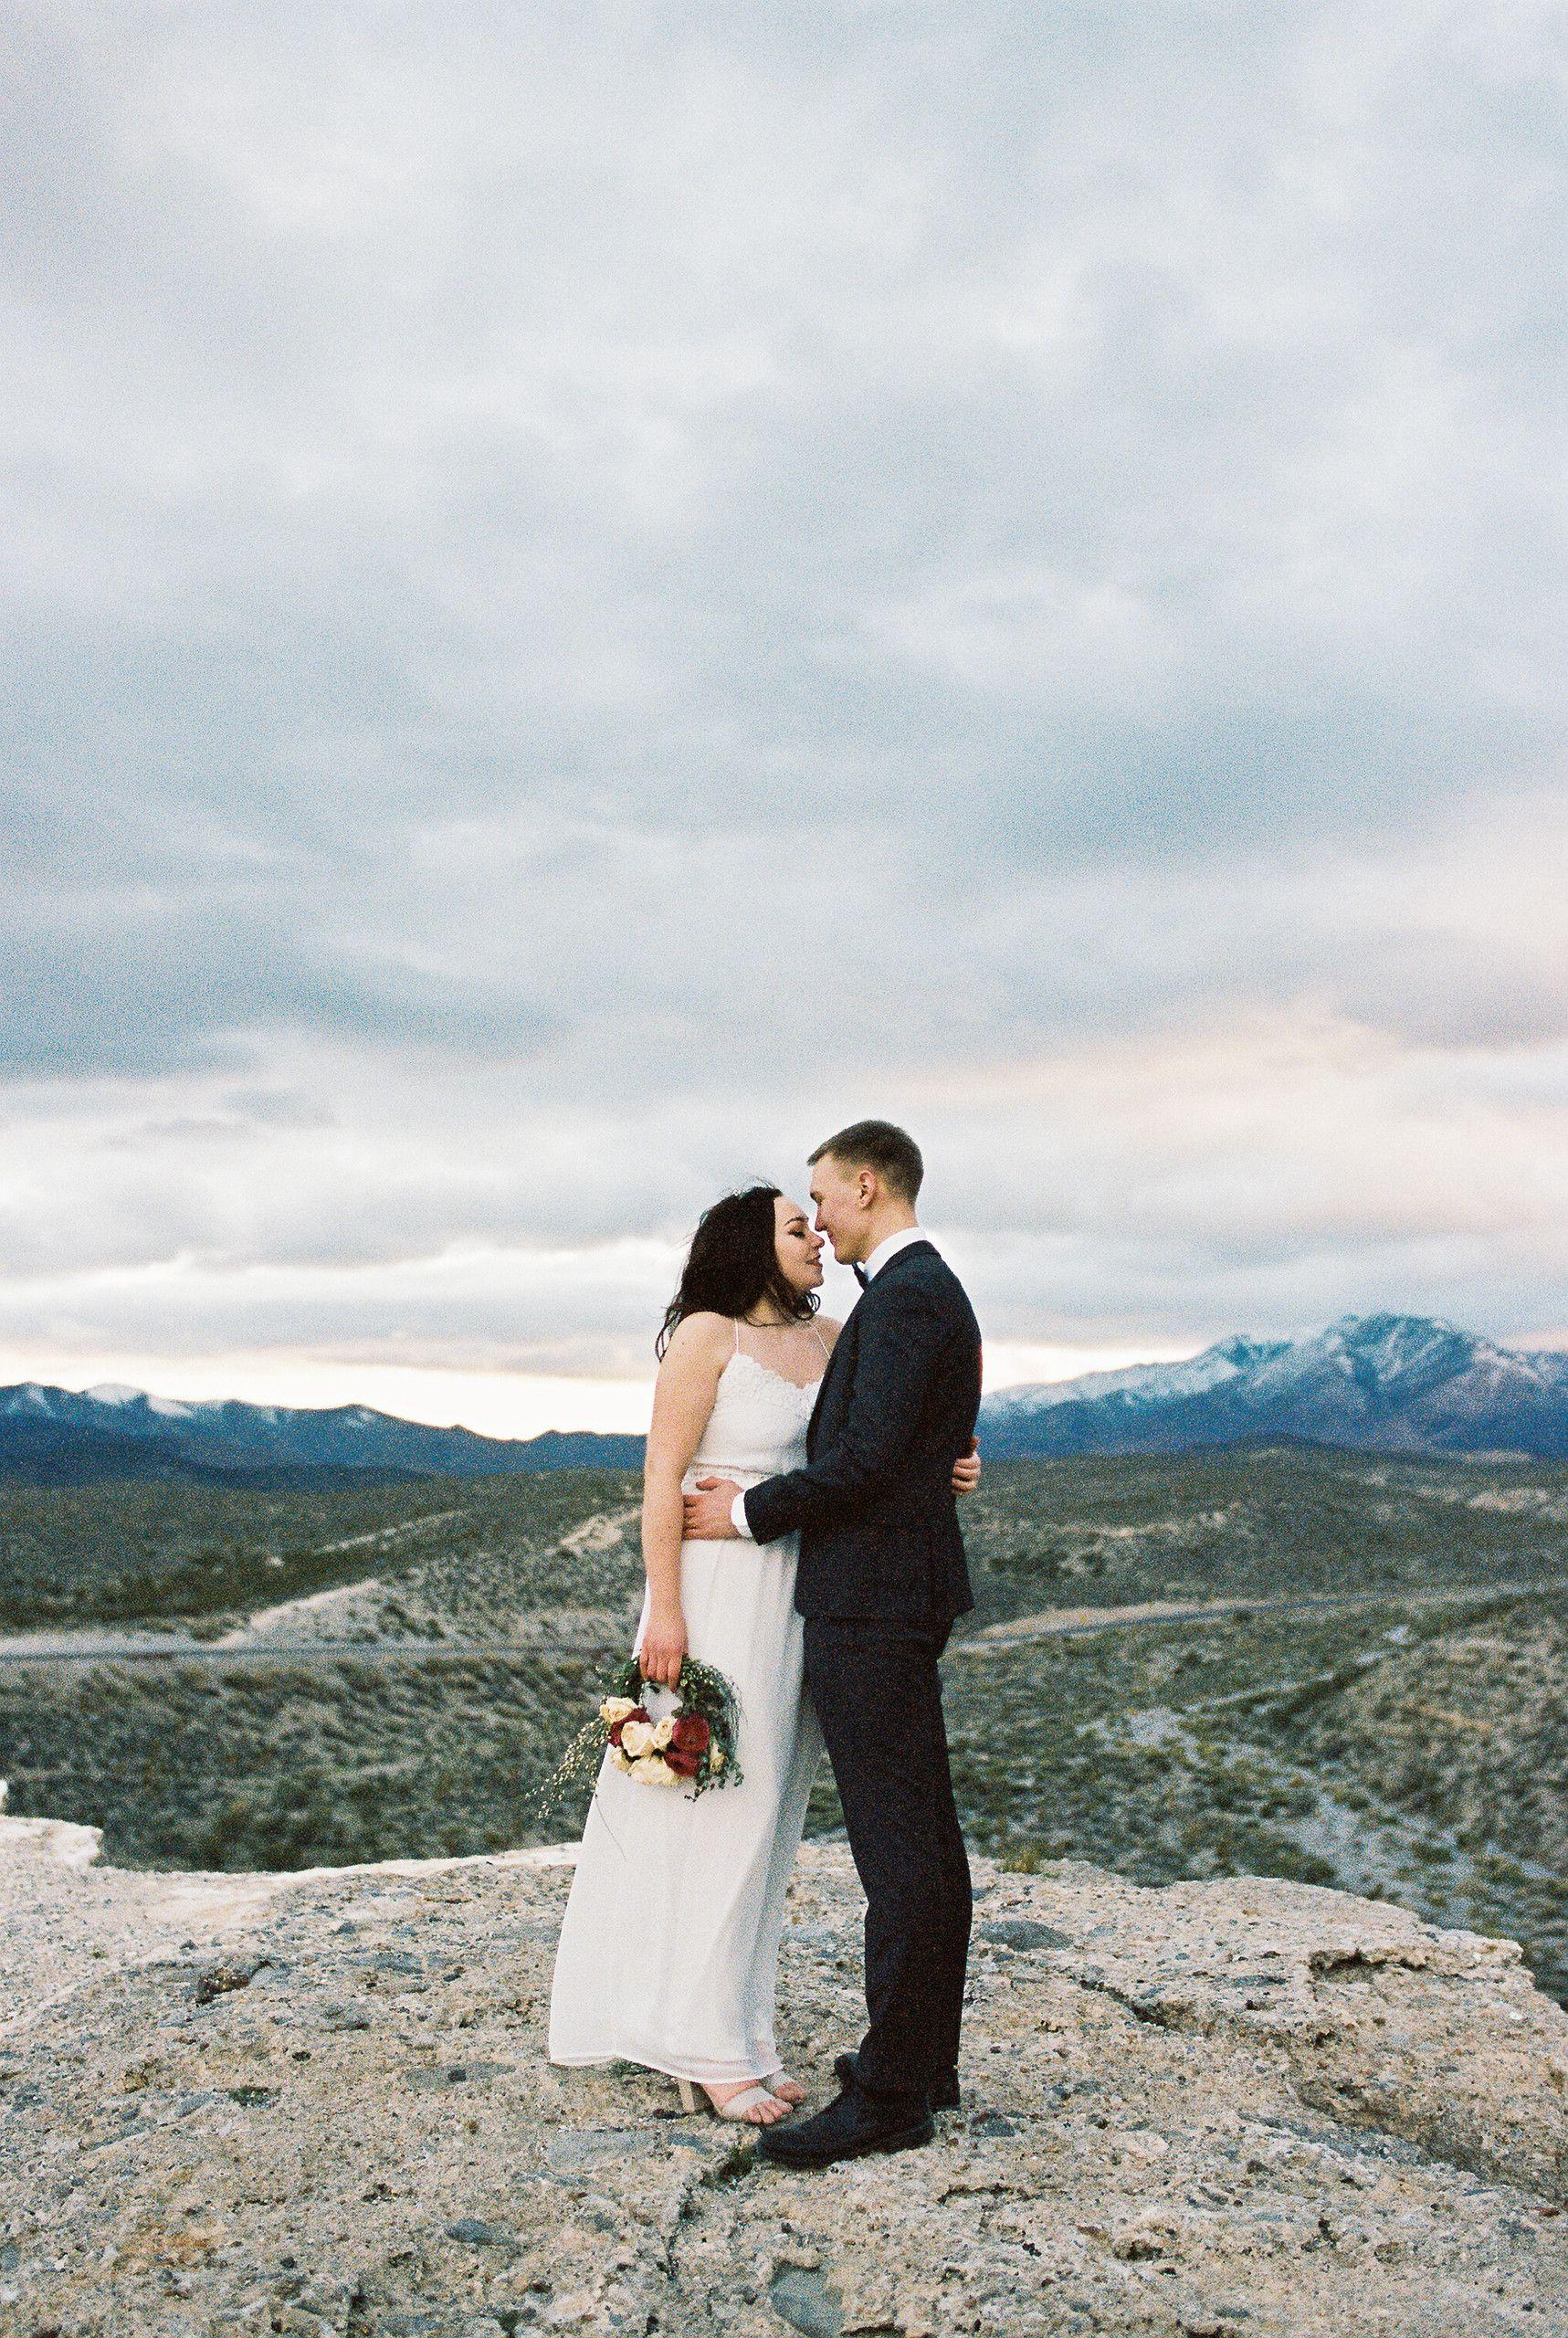 Fl Ring By Cultivate Goods Mt Charleston Elopement Filmphotography Filmisnotdead Fineartwedding Lasvegaswedding